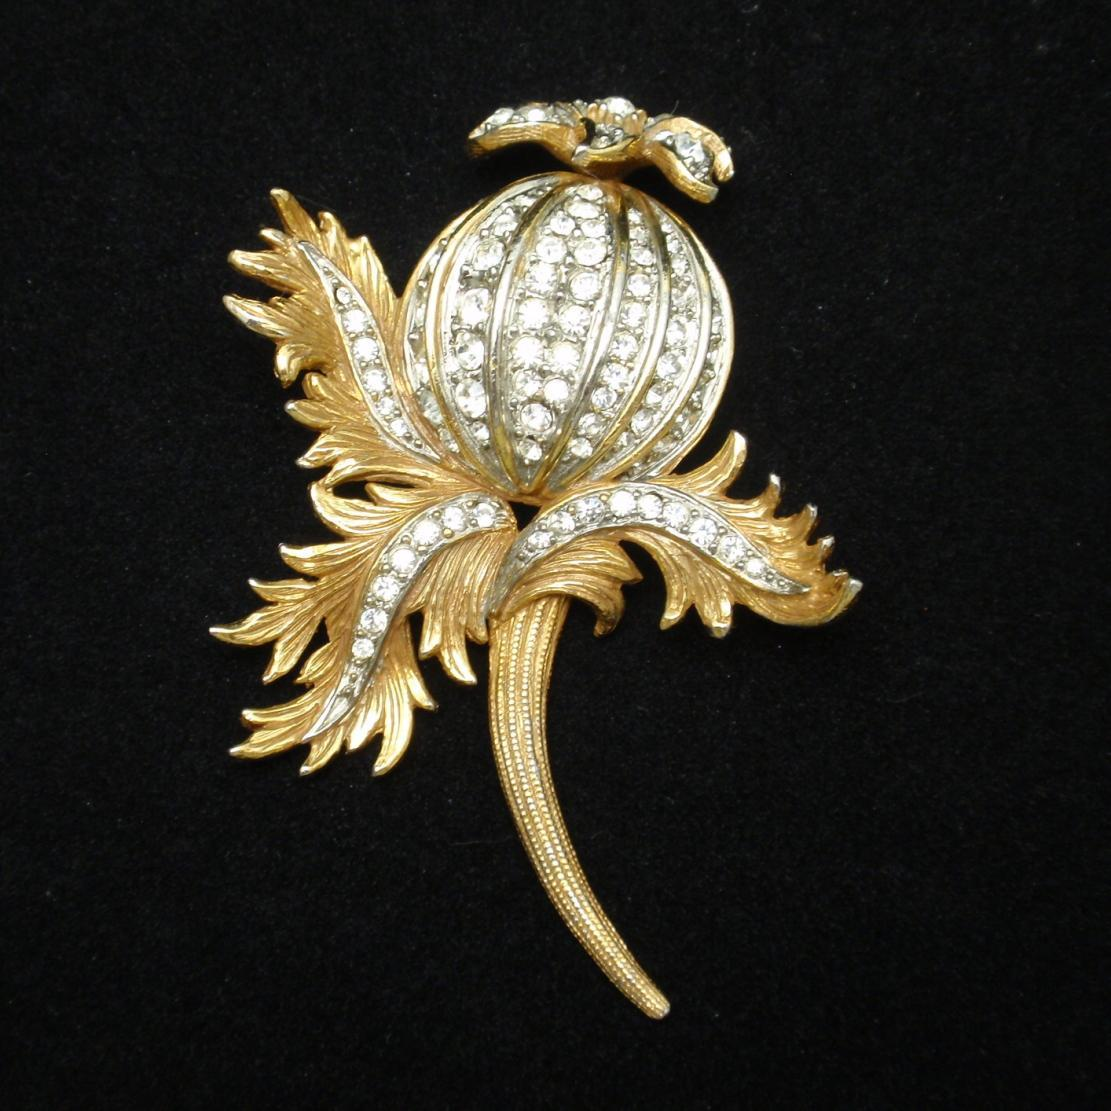 Thistle Flower Brooch Pin Rhinestones Gold Tone Metal Vintage Cadoro